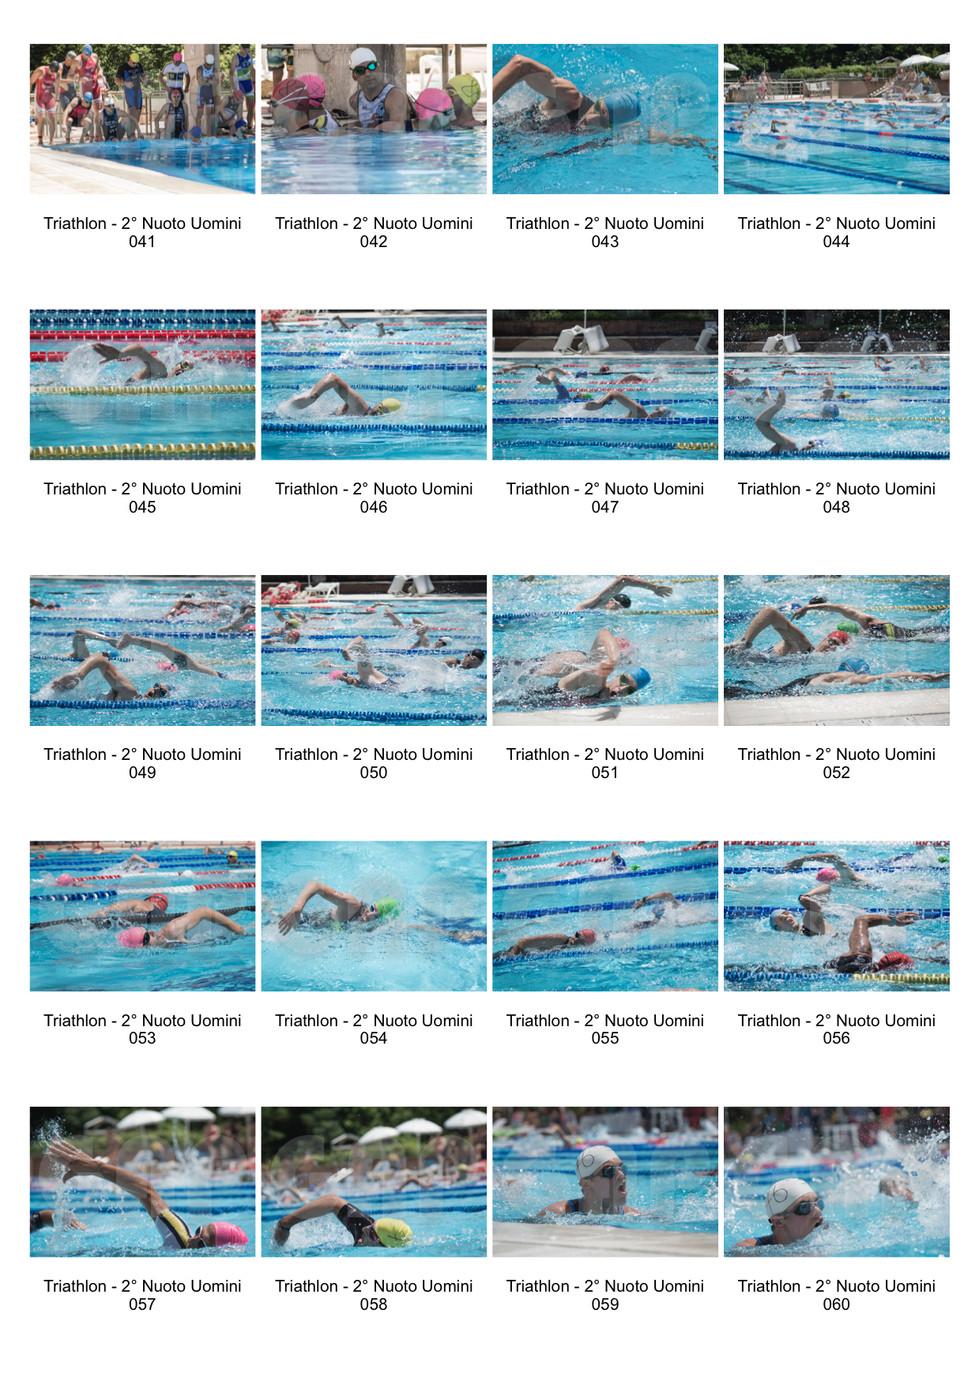 Triathlon_V.Elsa_-_2°_Frazione_Nuoto_Uomini_-3.jpg